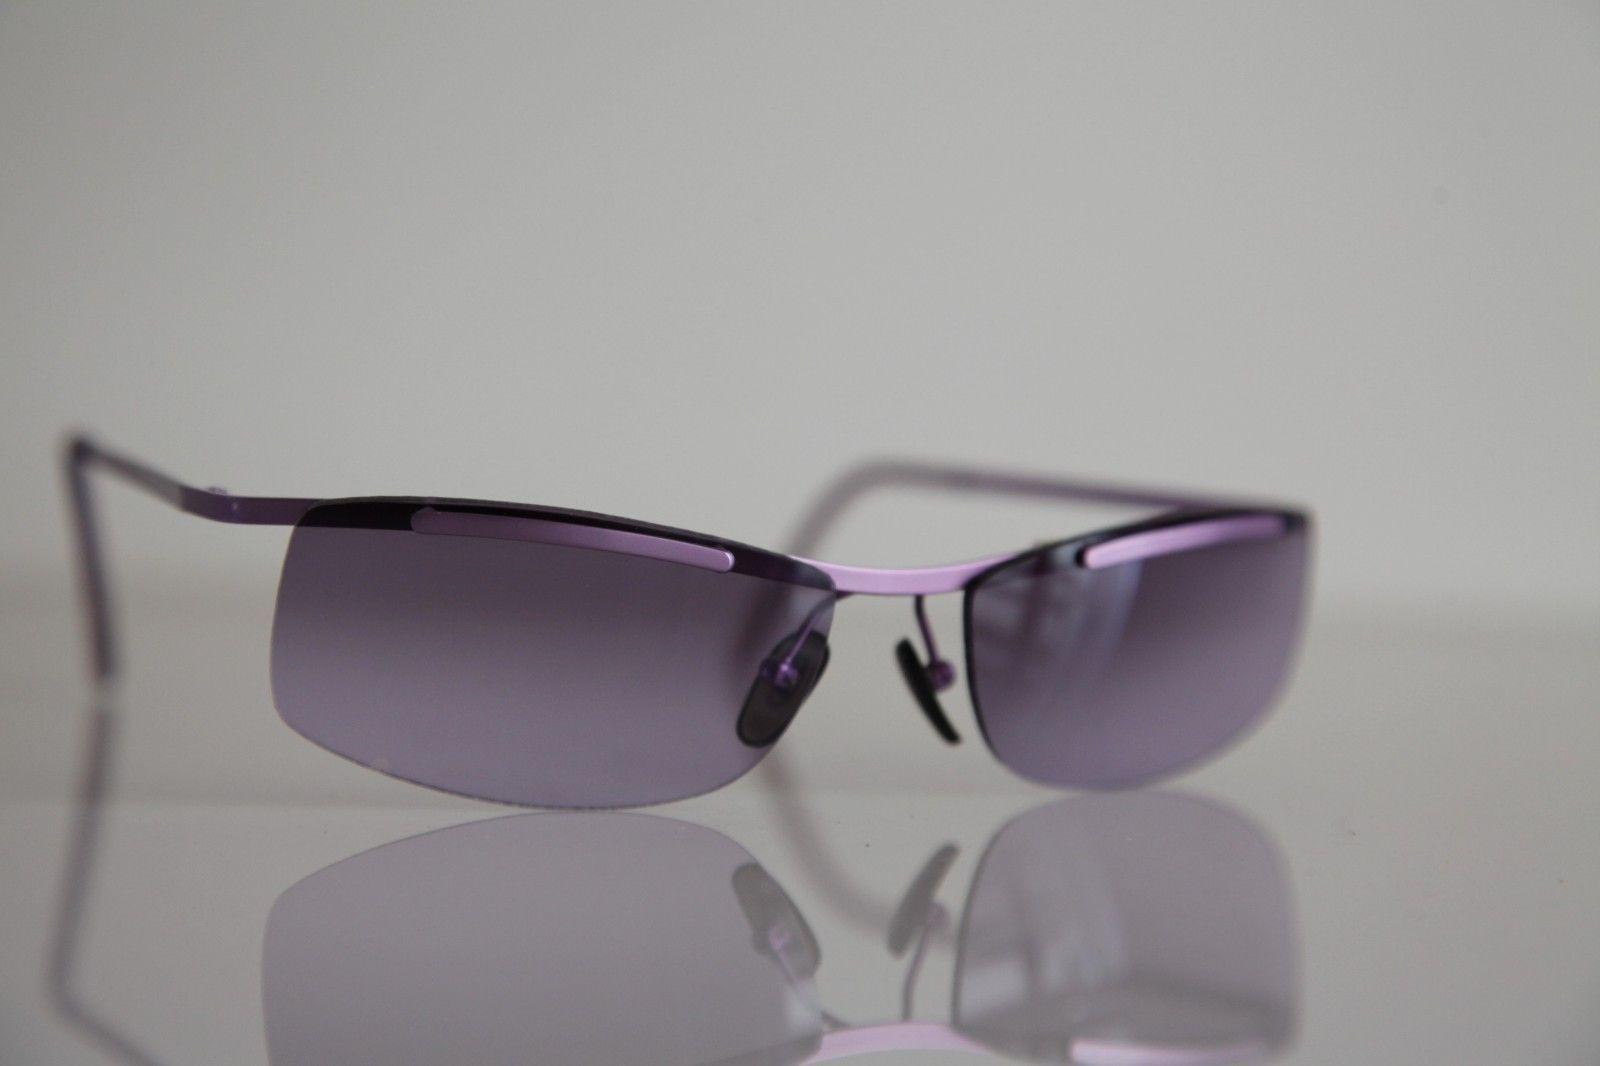 Rimless Glasses Nz : Metallic Pink Rimless Cat Eye Sunglasses Pink lenses ...